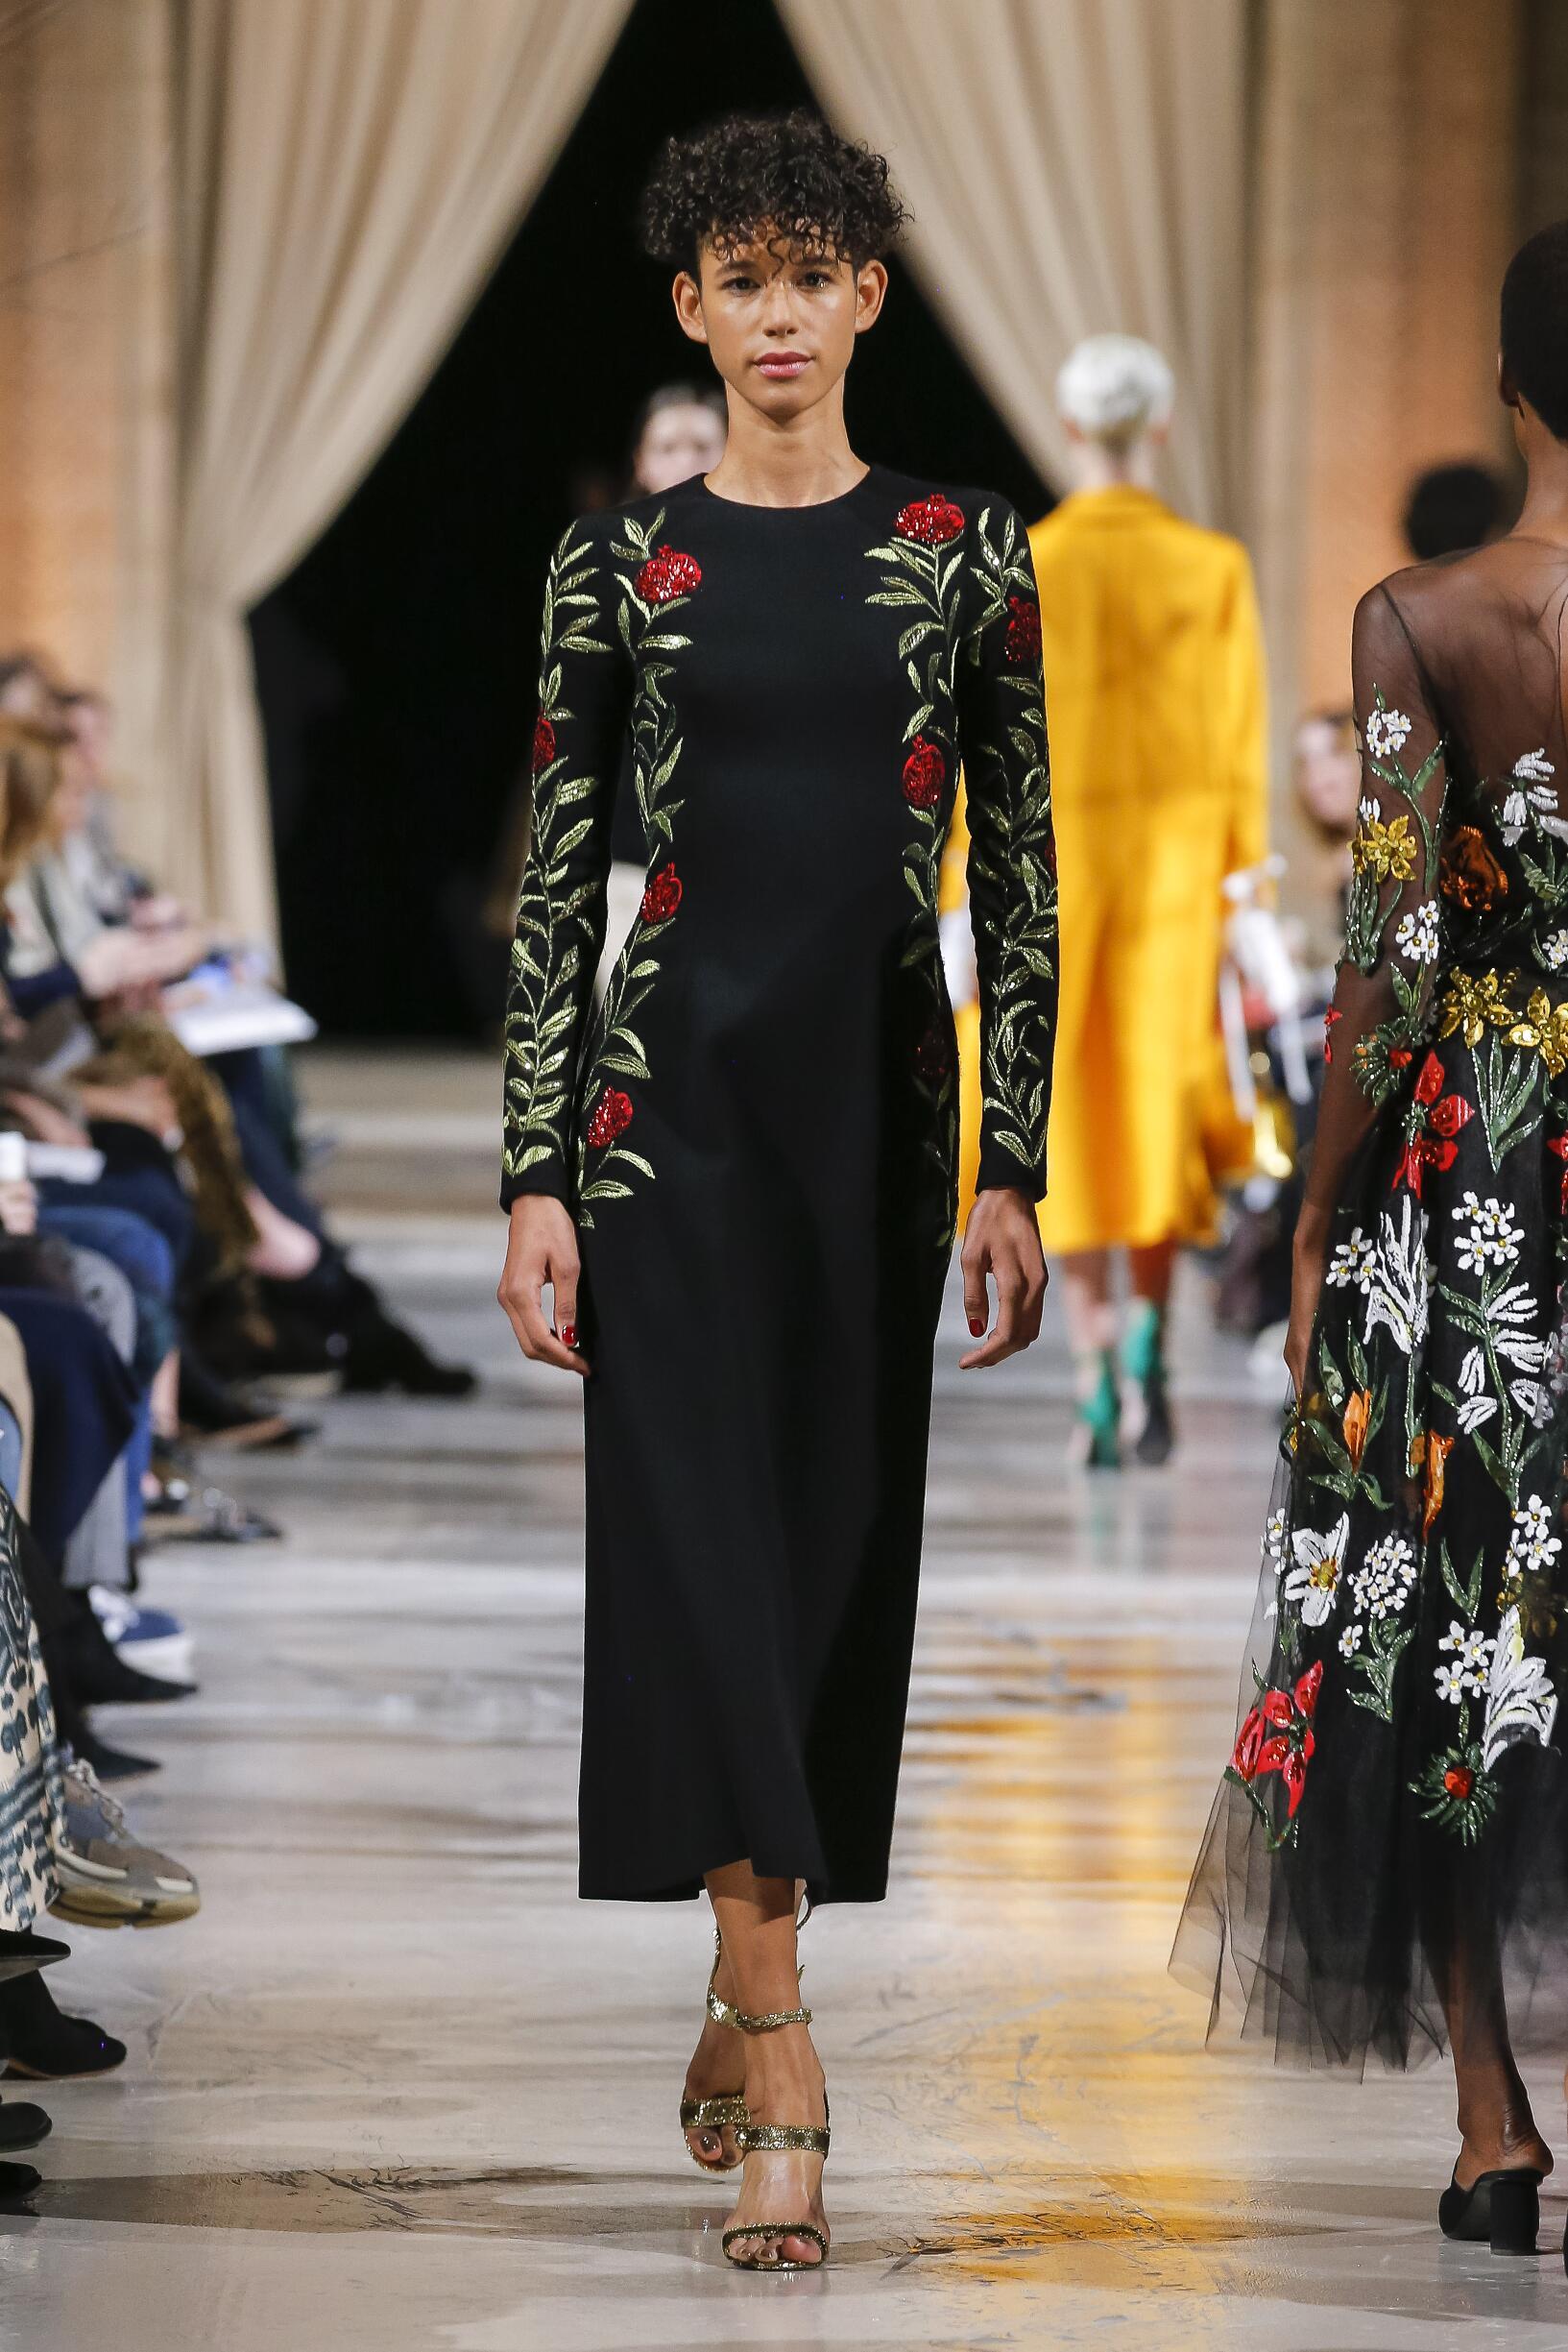 Catwalk Oscar de la Renta Woman Fashion Show Winter 2018